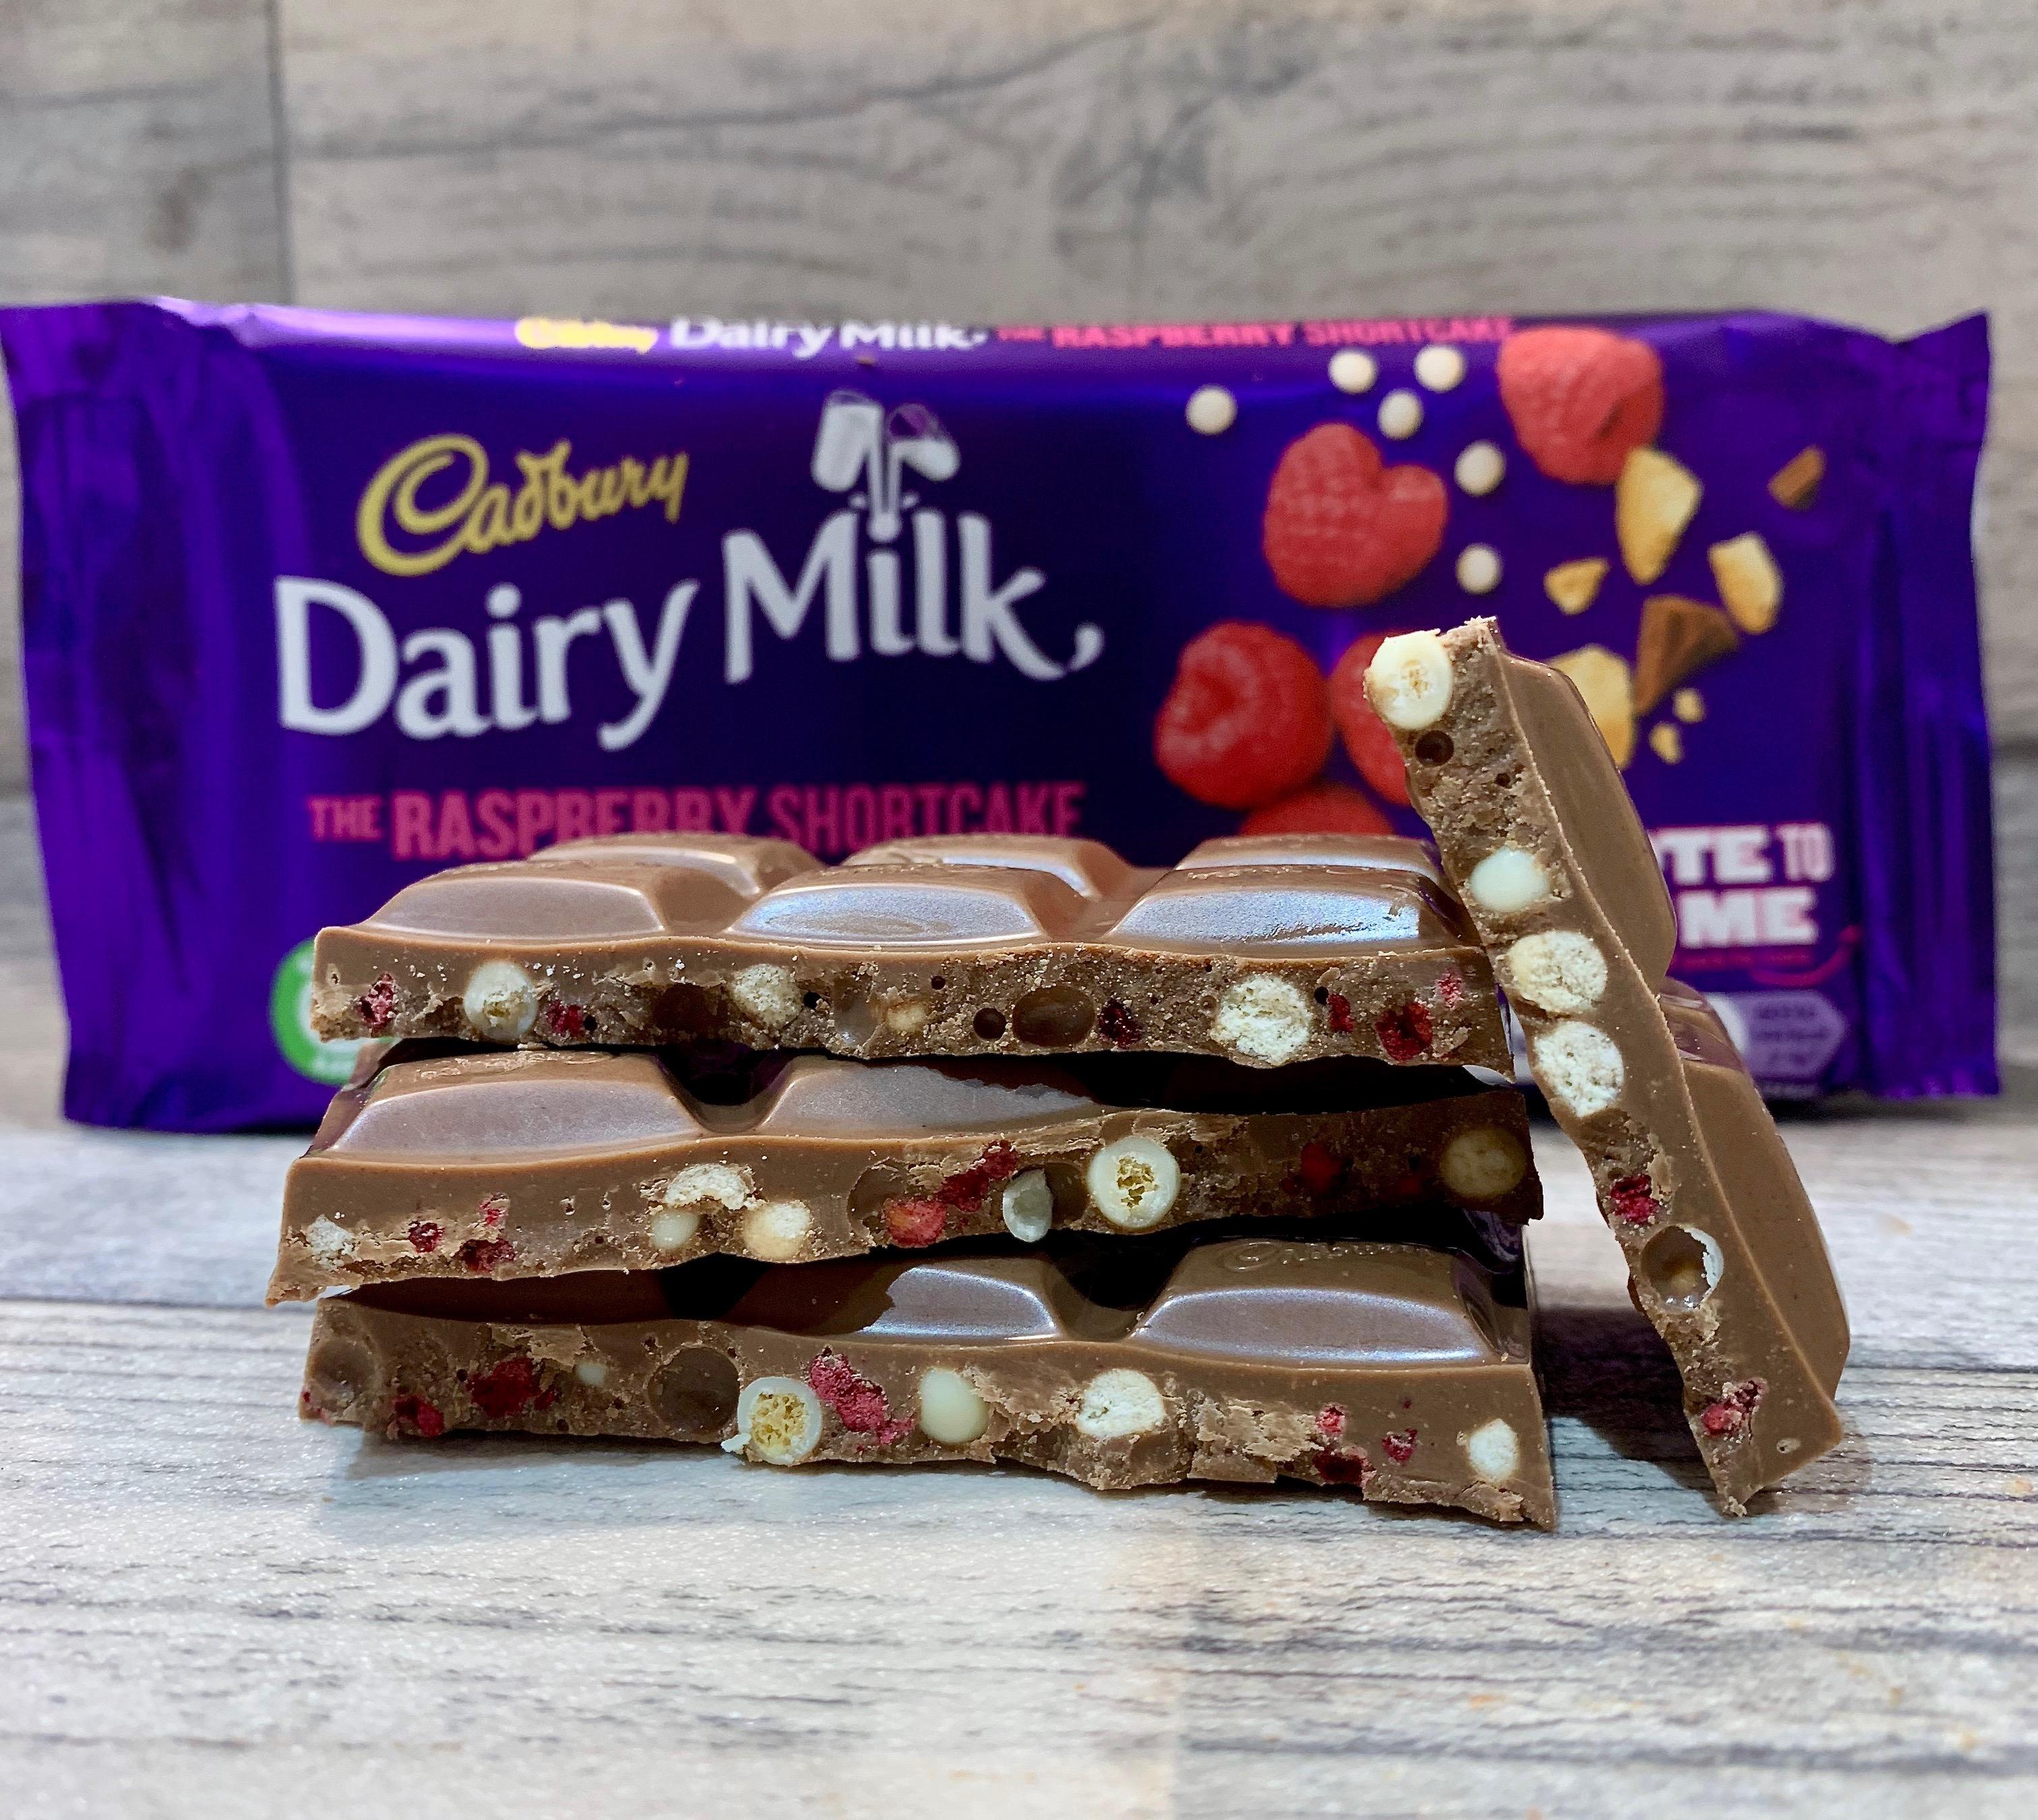 Cadbury Dairy Milk Raspberry Shortcake Bar